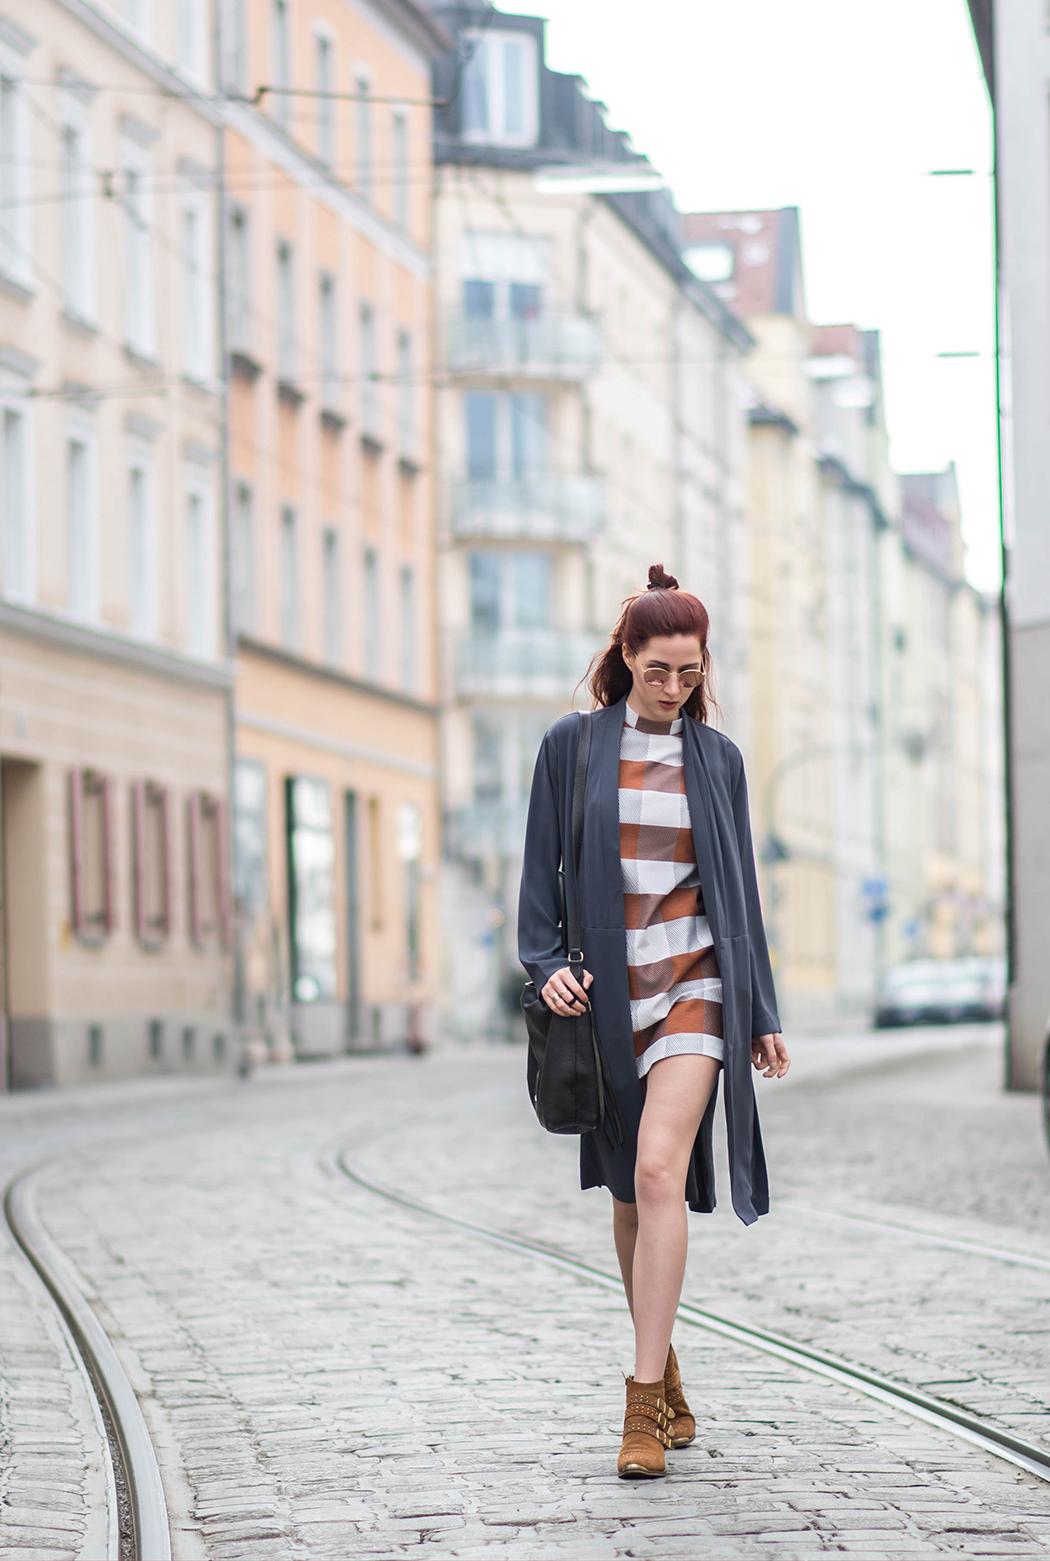 Lindarella-Fashionblog-München-Deutschland-Fashion-Blog-Fashionblogger-Etuikleid-Chloé-Boots-1